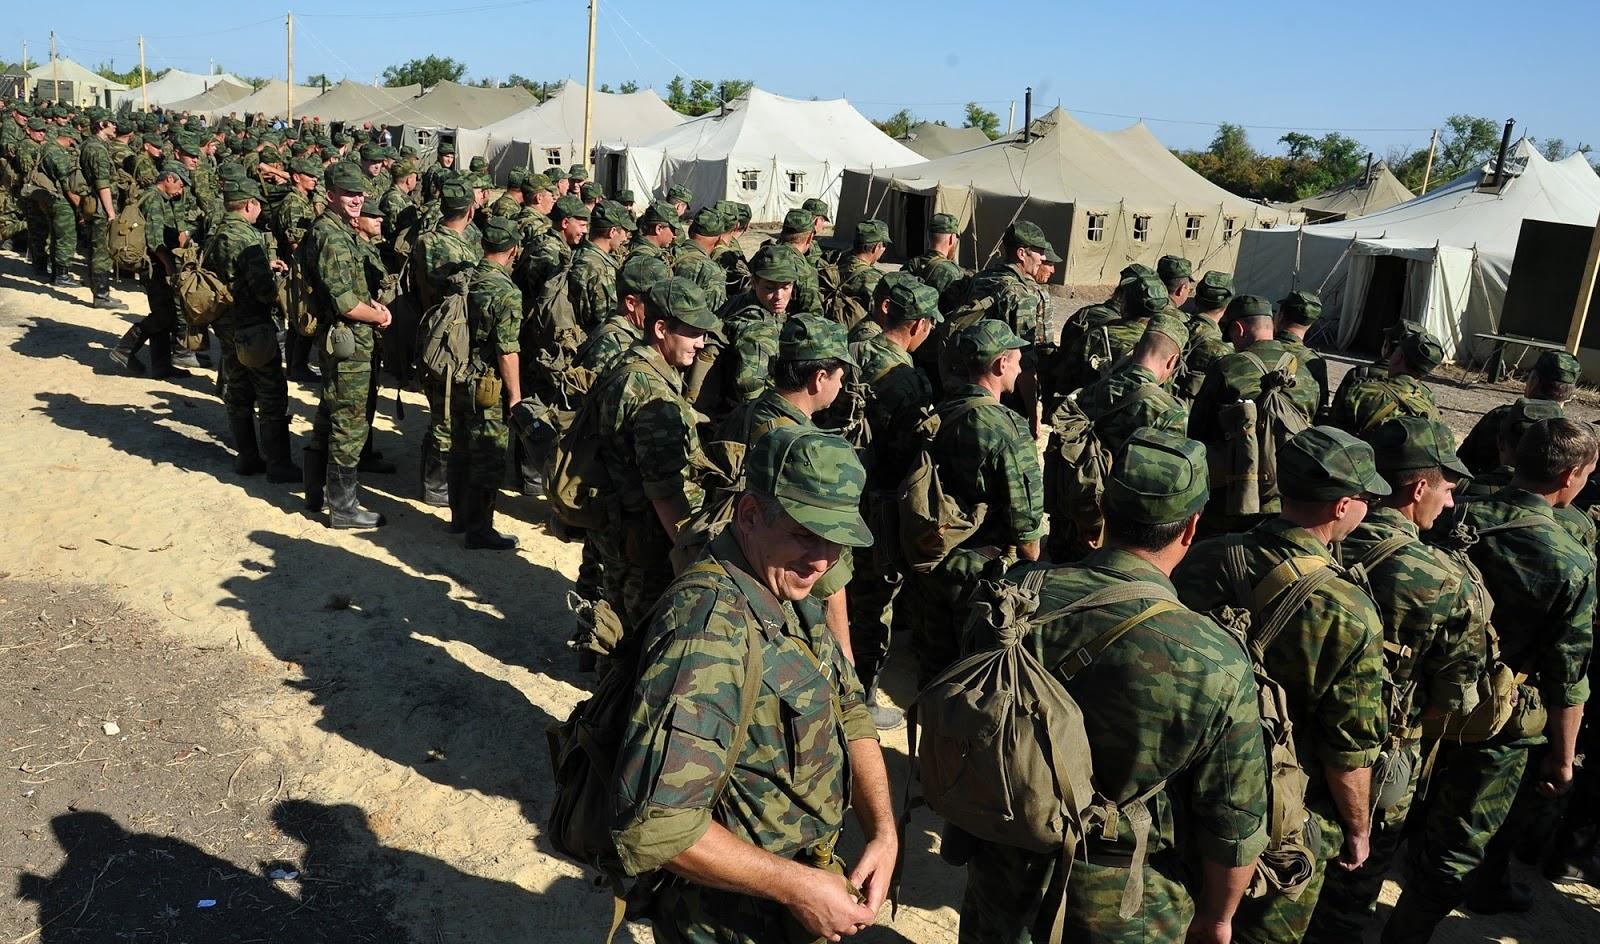 Солдаты на сборах